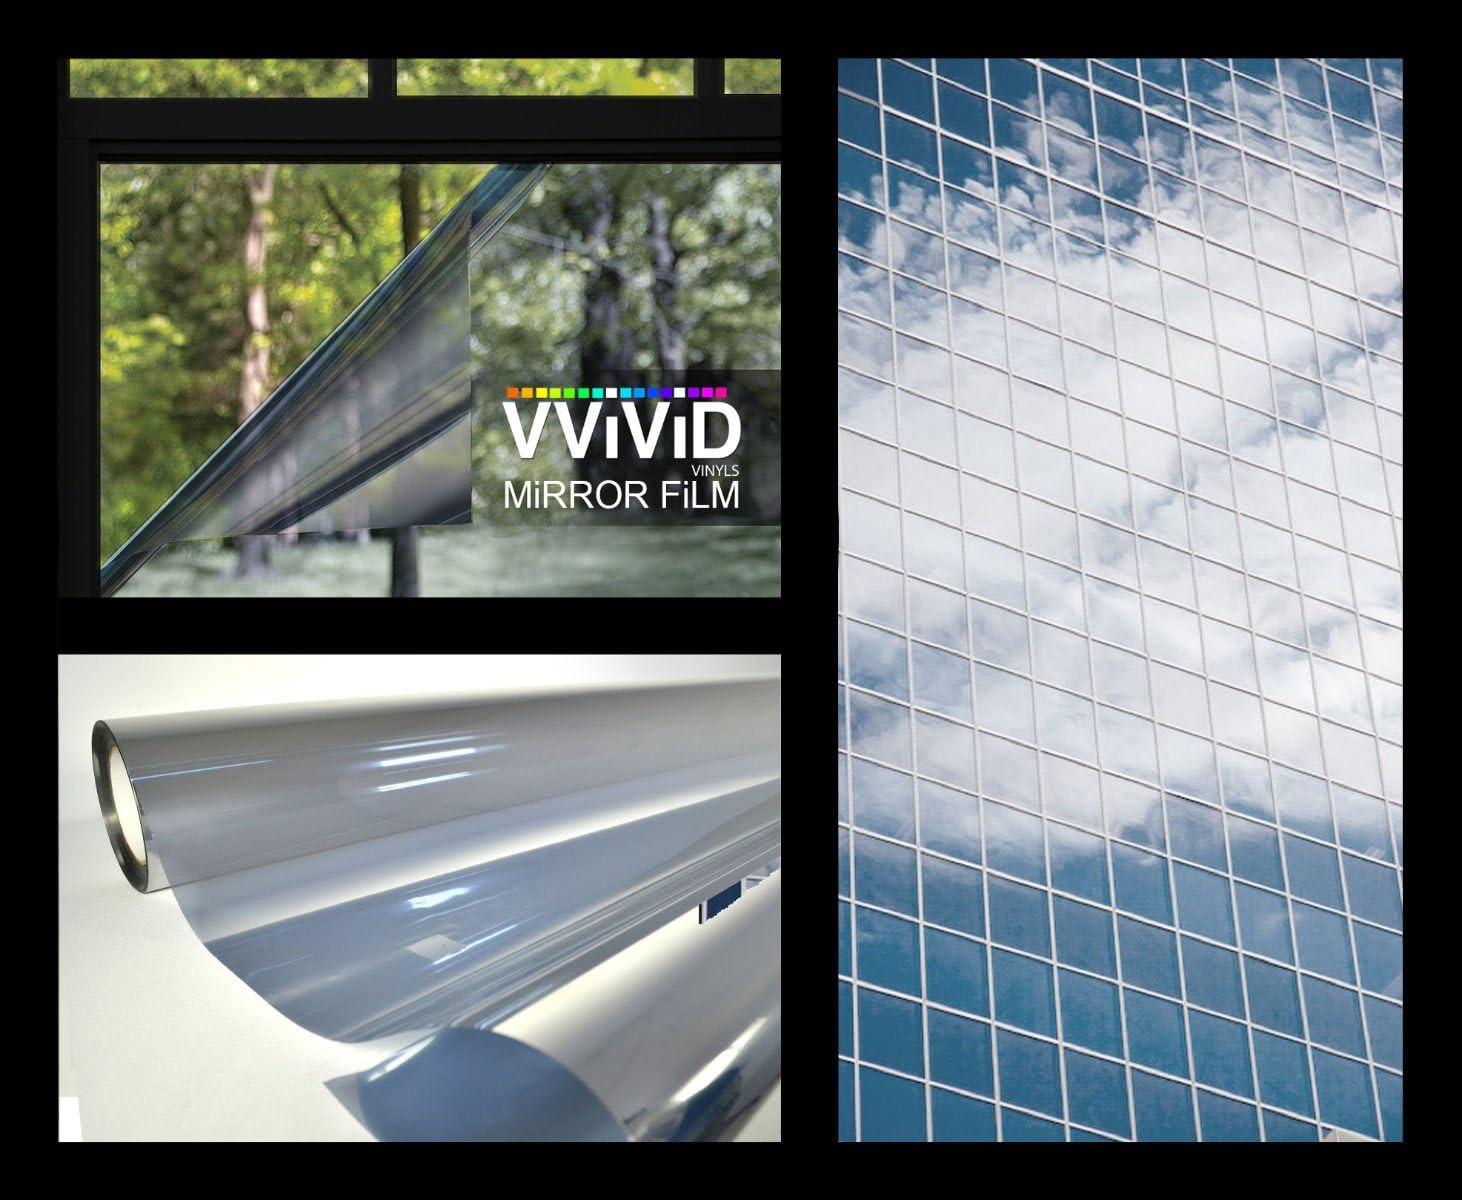 VViViD One Way Mirror Silver Window Film (30 Inch x 15ft)